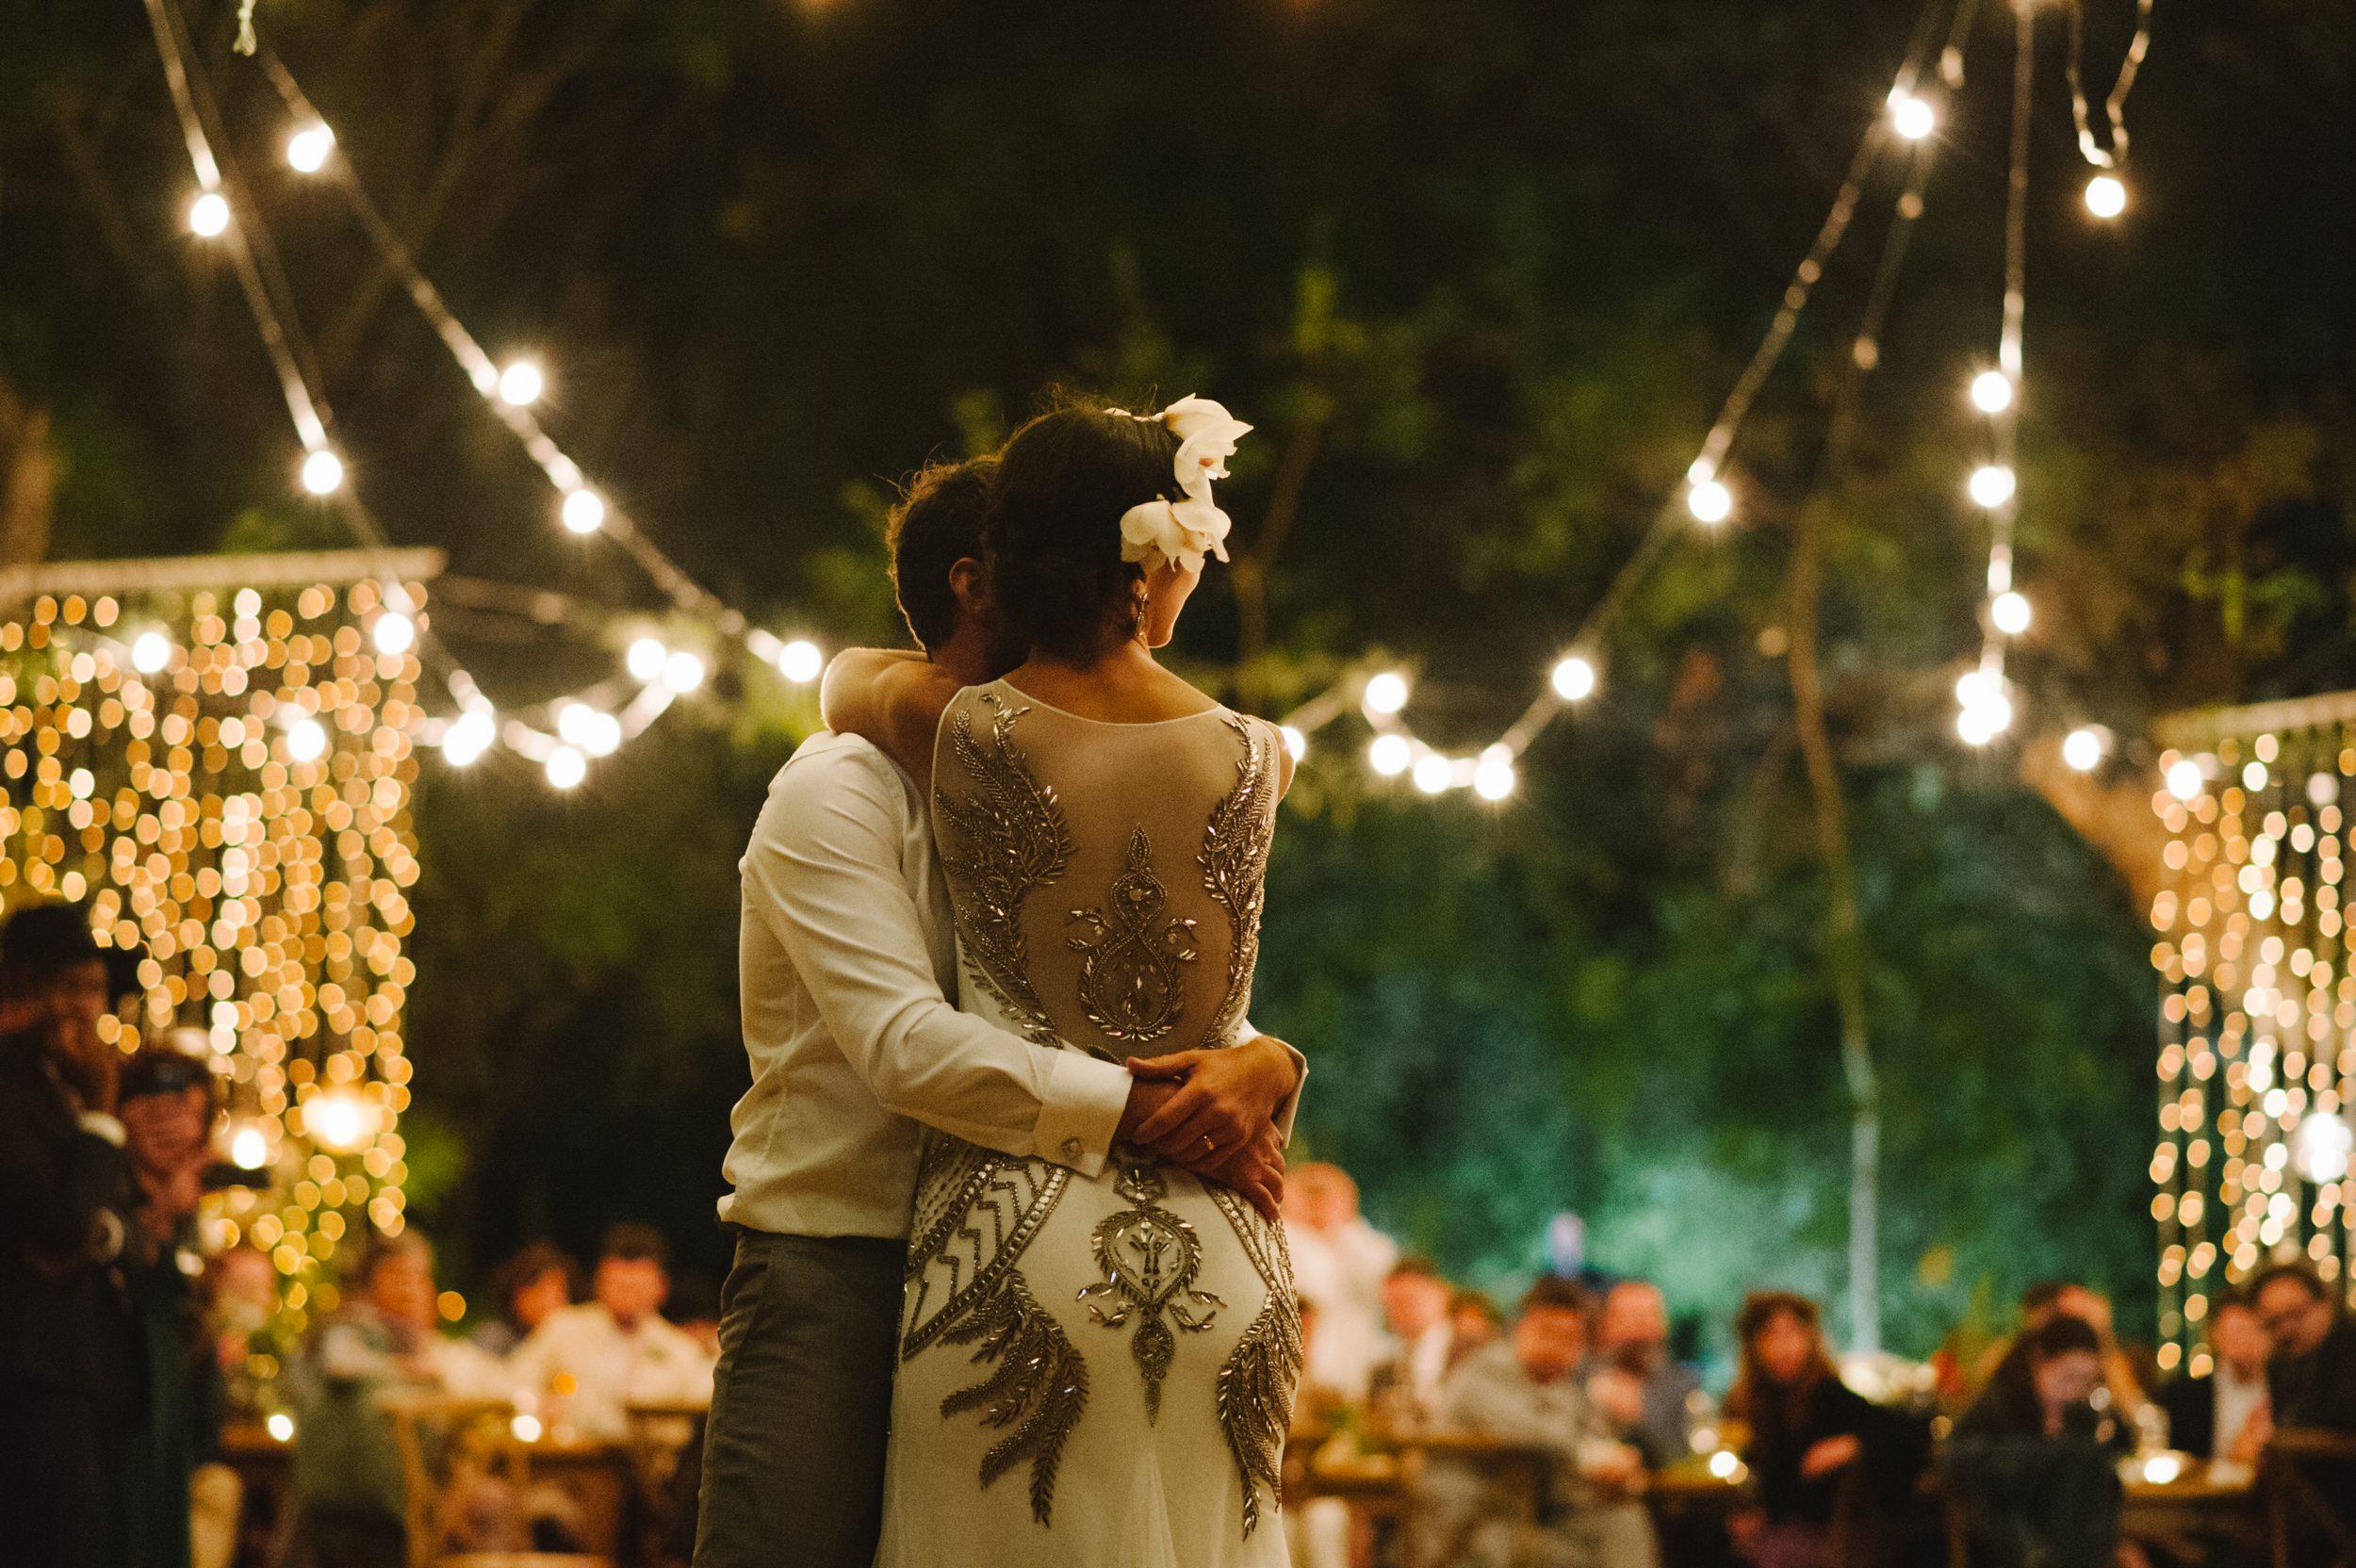 Latisha & Luke - A wedding under the stars at Hawksmoor House,Stellenbosch.Planner: Agape Wedding and Event DesignFlowers: OpusBouquet: Ariel DearieDress: Rue de SeineFood: Karen Dudley